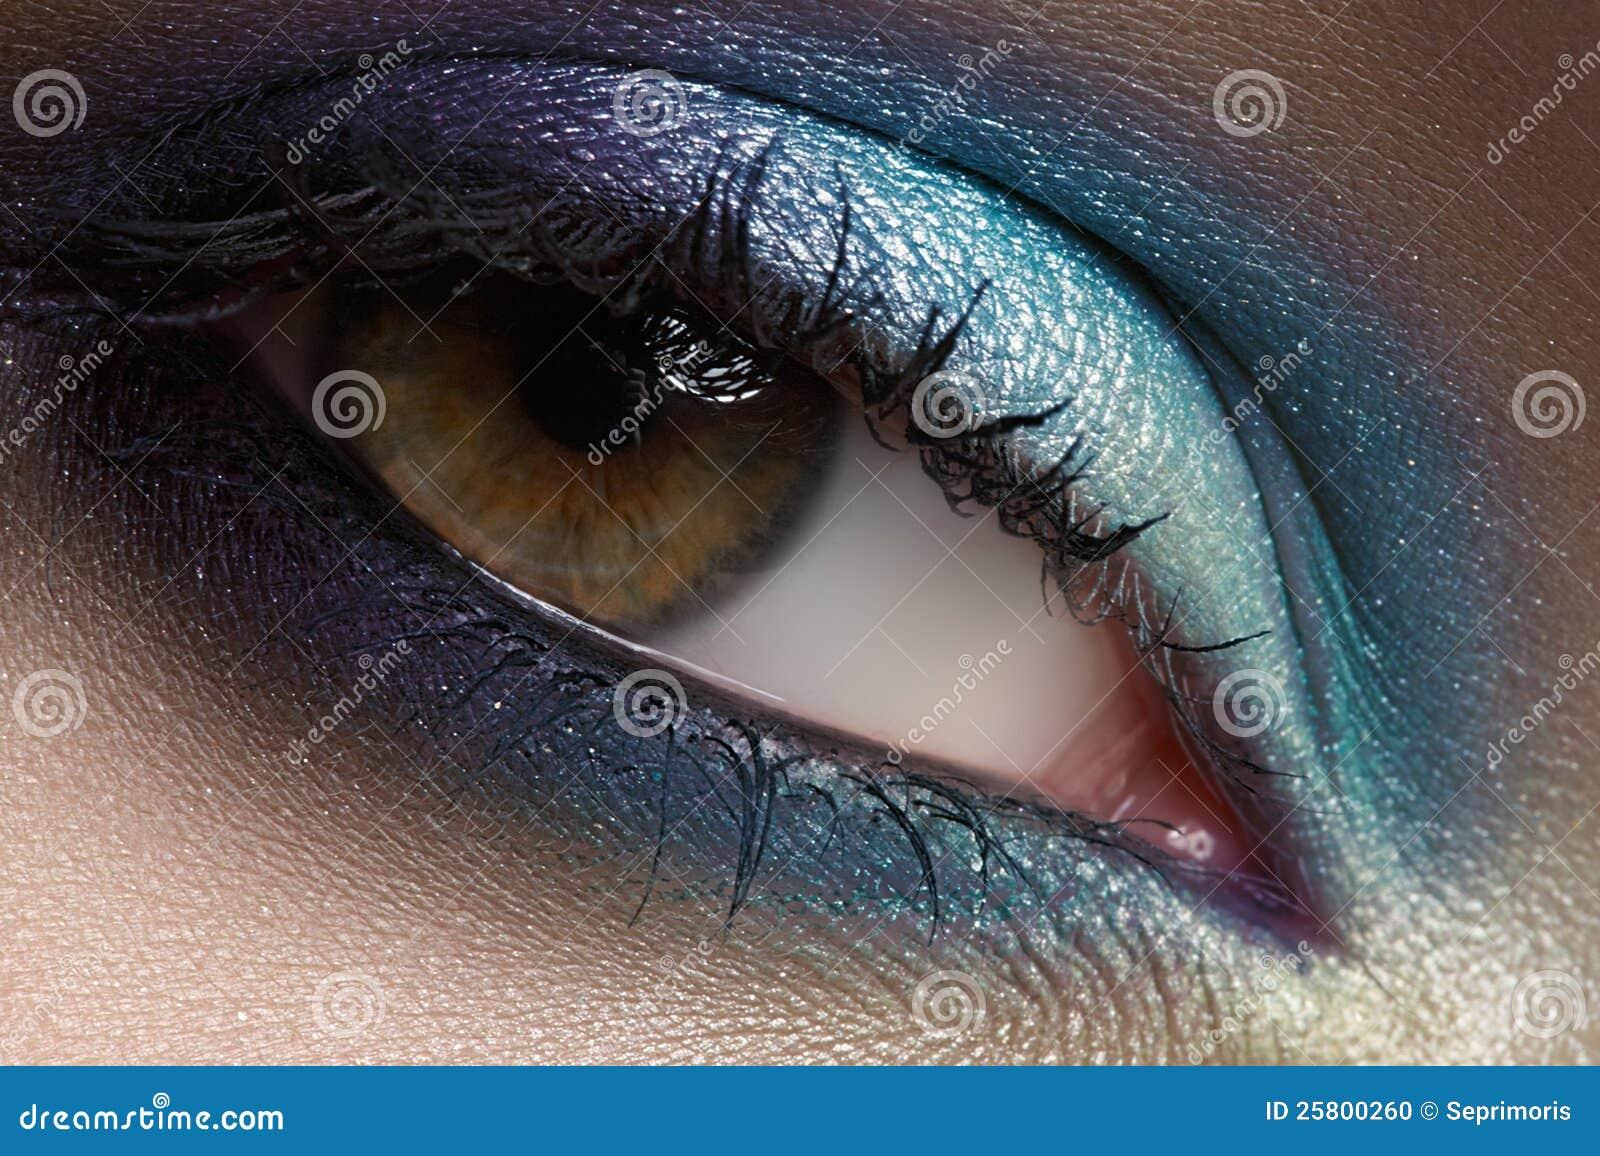 Mustert Kosmetik, Augenschminke. Nahaufnahmeart und weiseverfassung